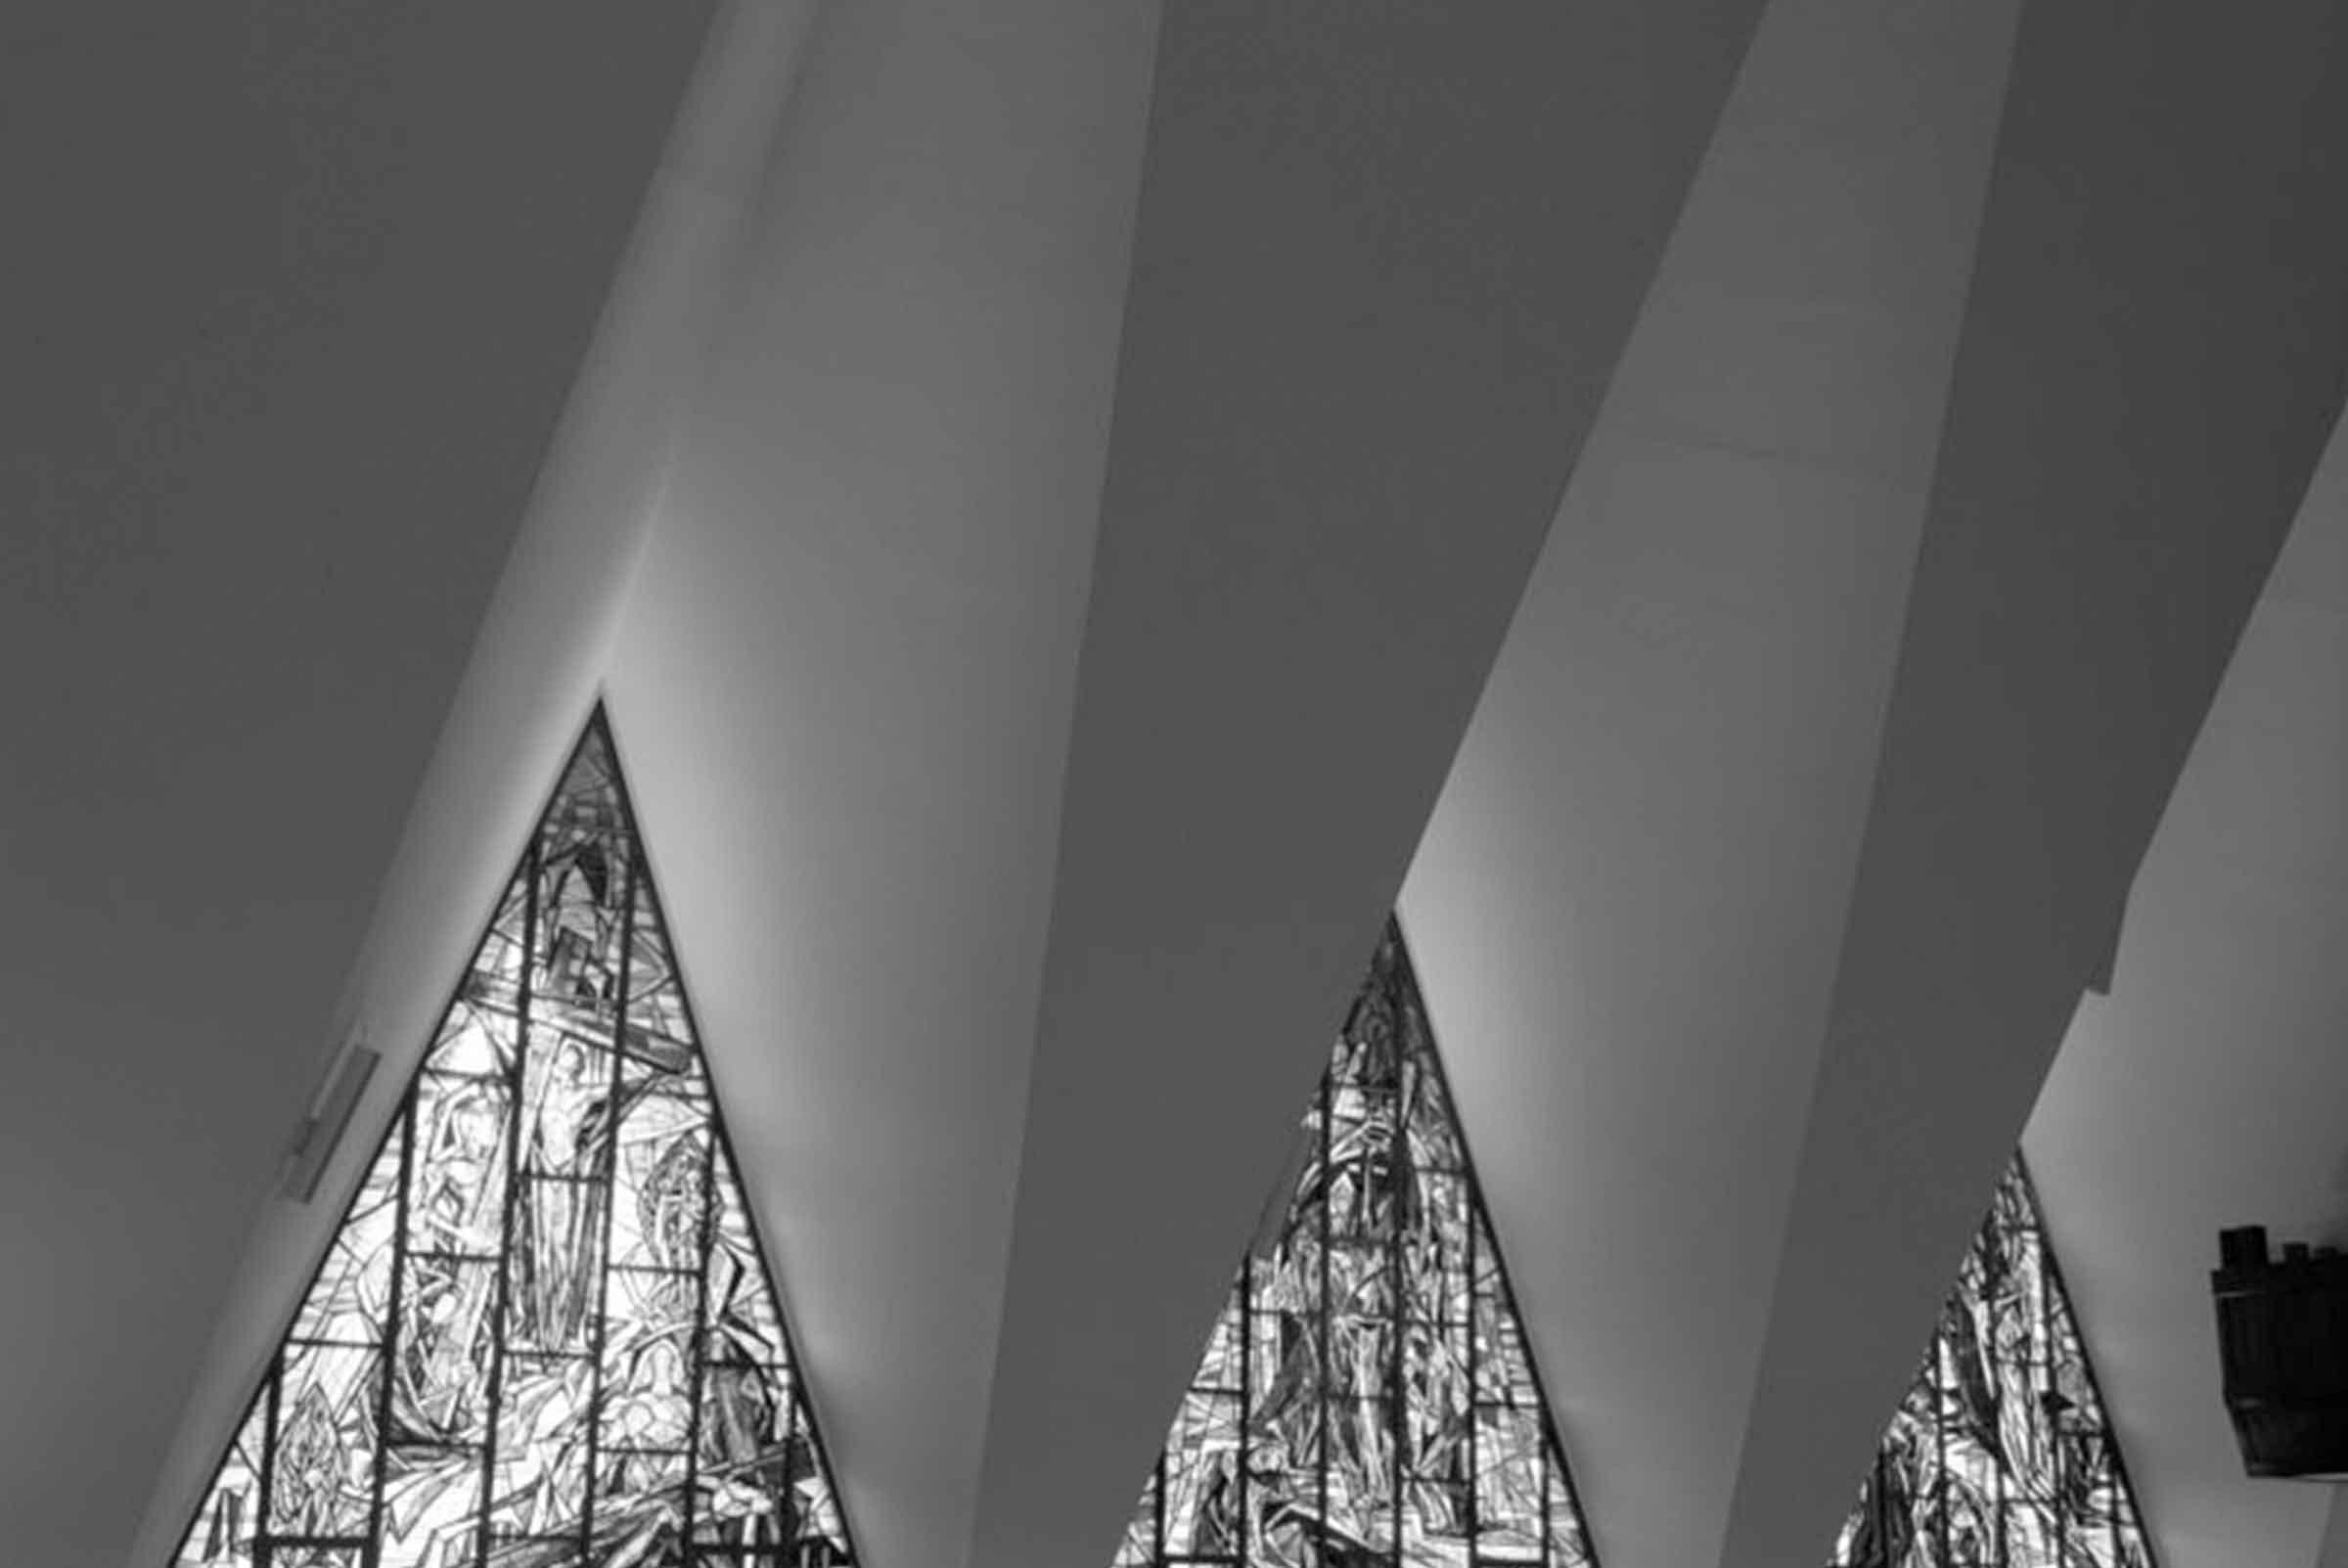 Architecture of Paul R. Williams